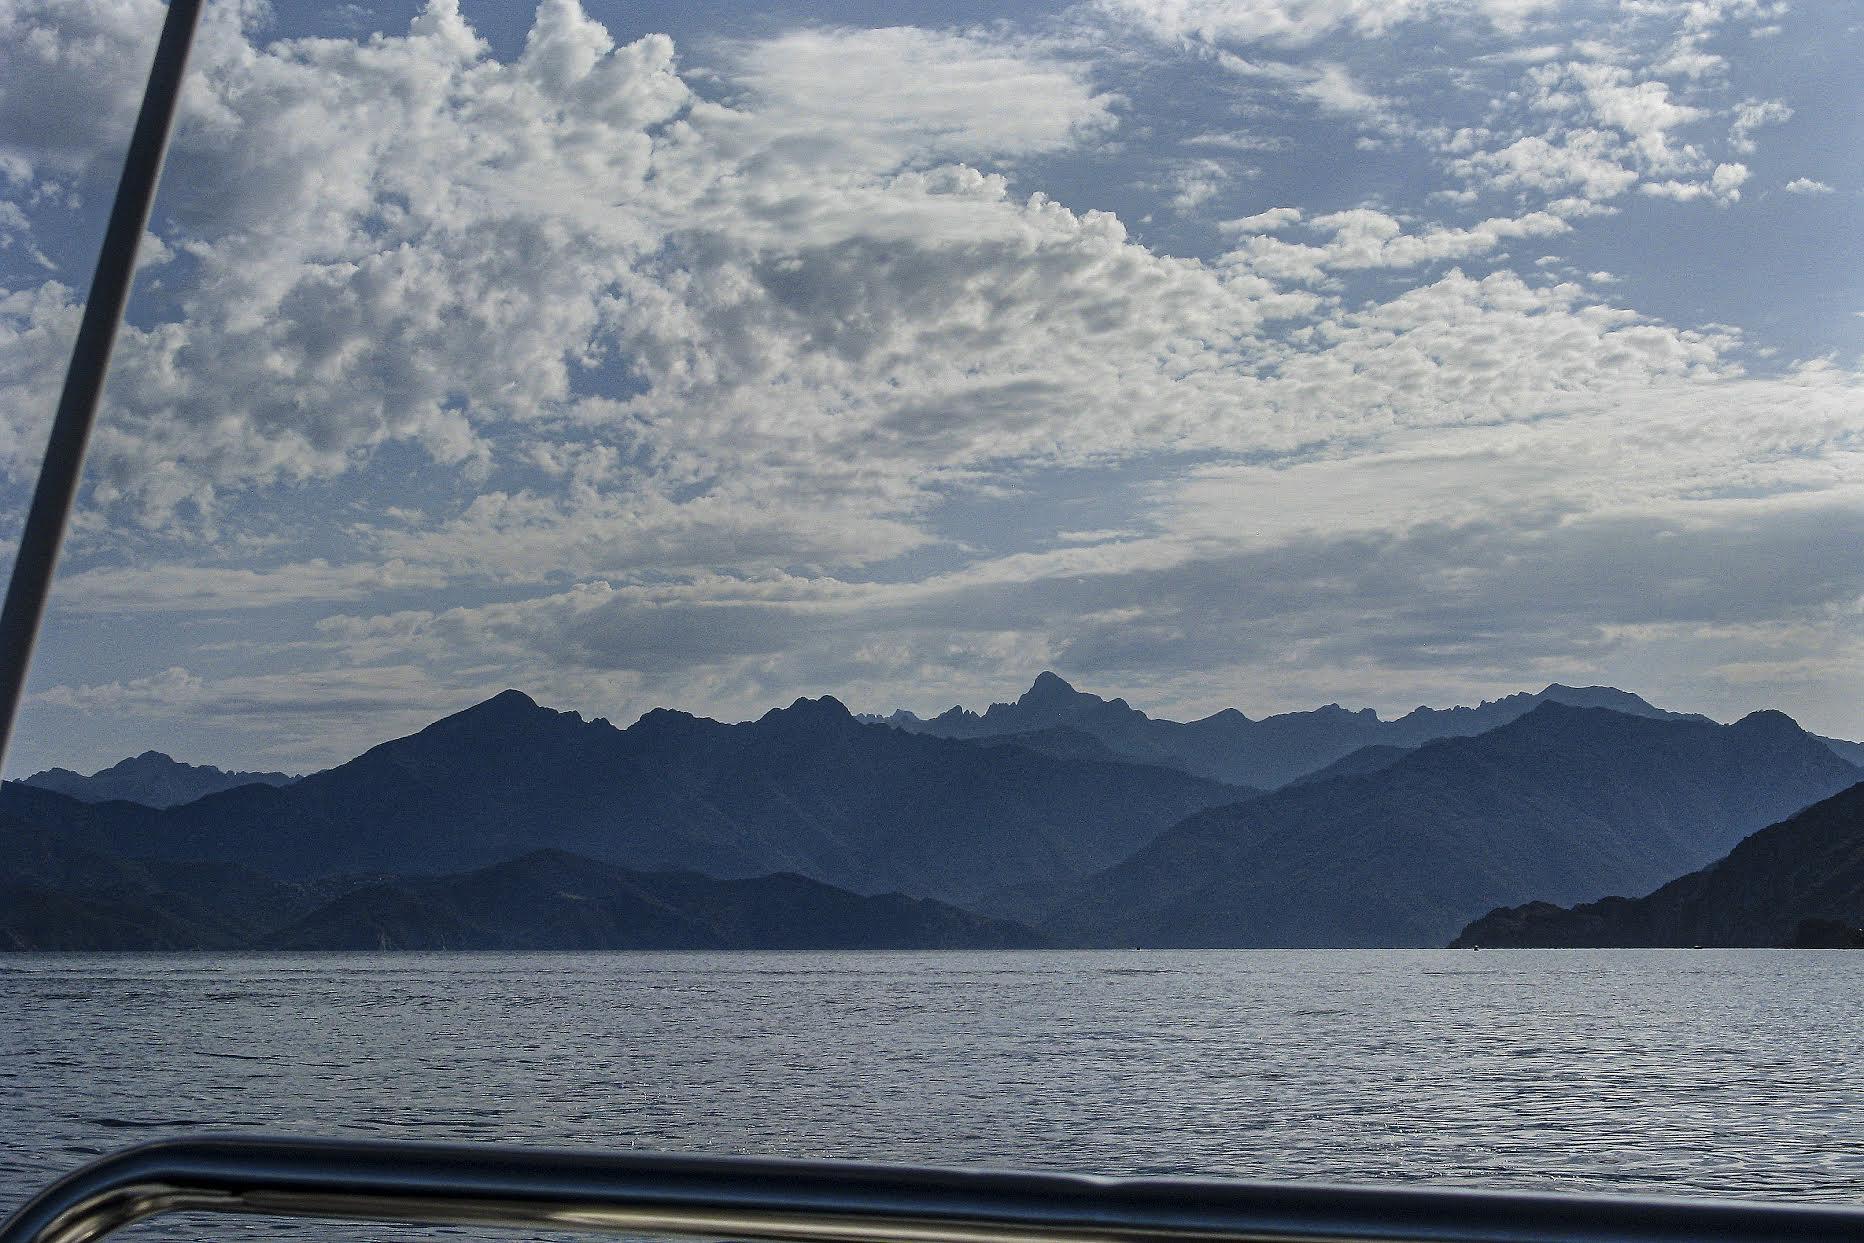 Le Monte Cintu vu du golfe de Portu (Enrico Chiavacci)